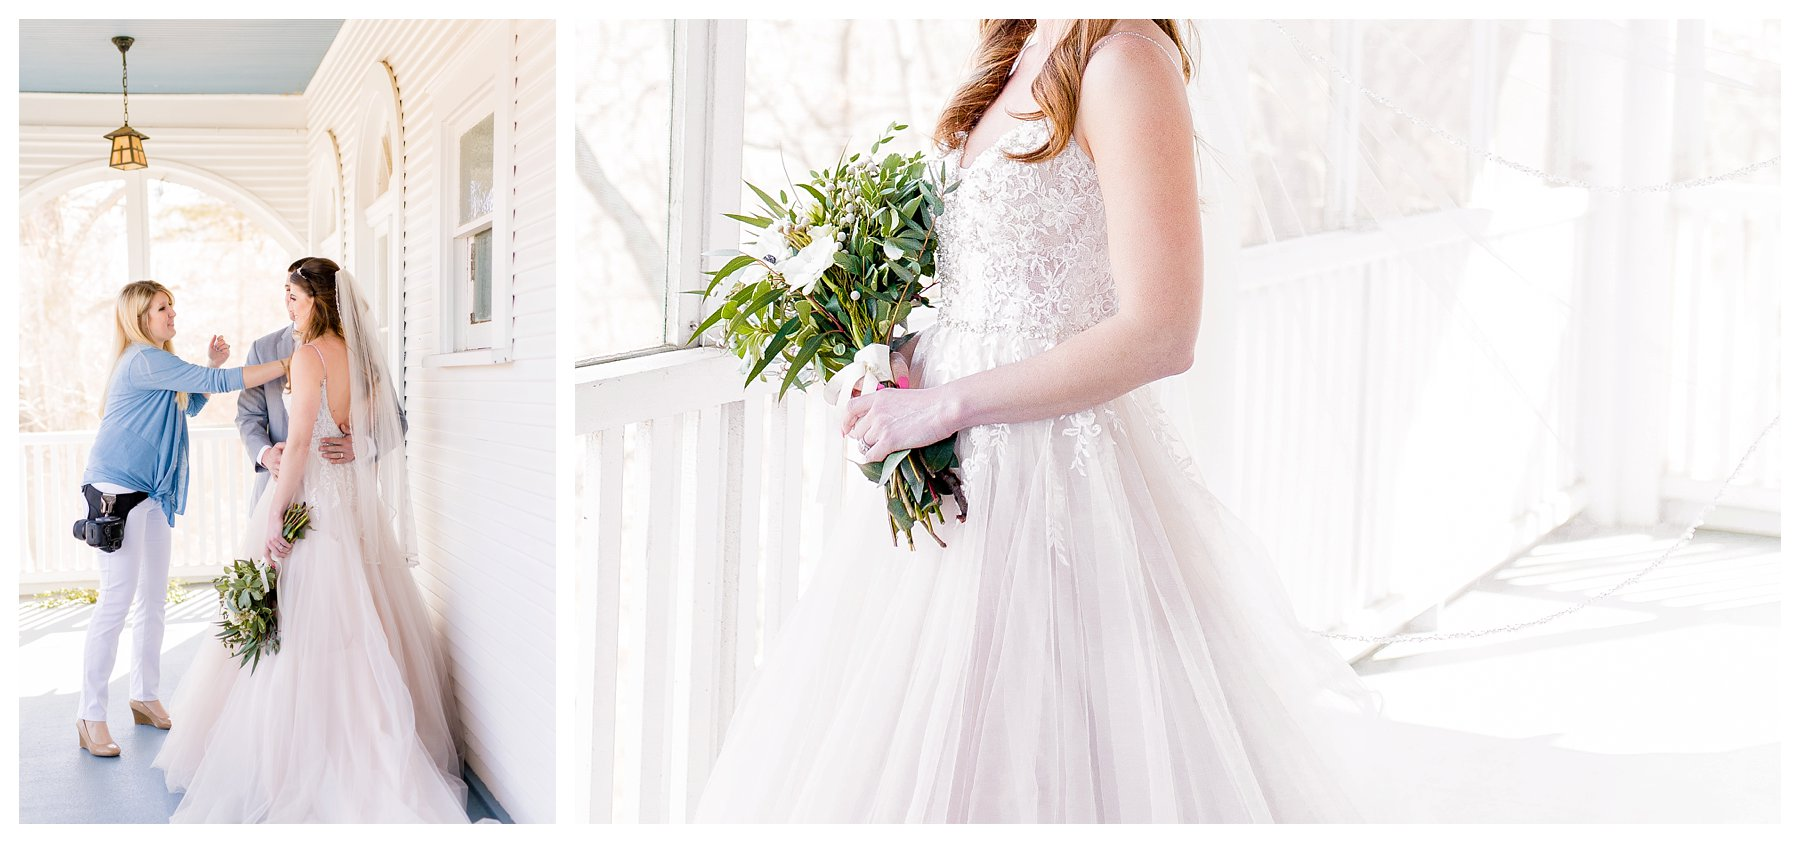 photographer_wedding_saint_louis_Kansas_City_Photography_Videography_workshop_training_styled_engagement_Lake_Ozark_KC_MO_STL_Rolla_Hermann_Saint_James_0390.jpg